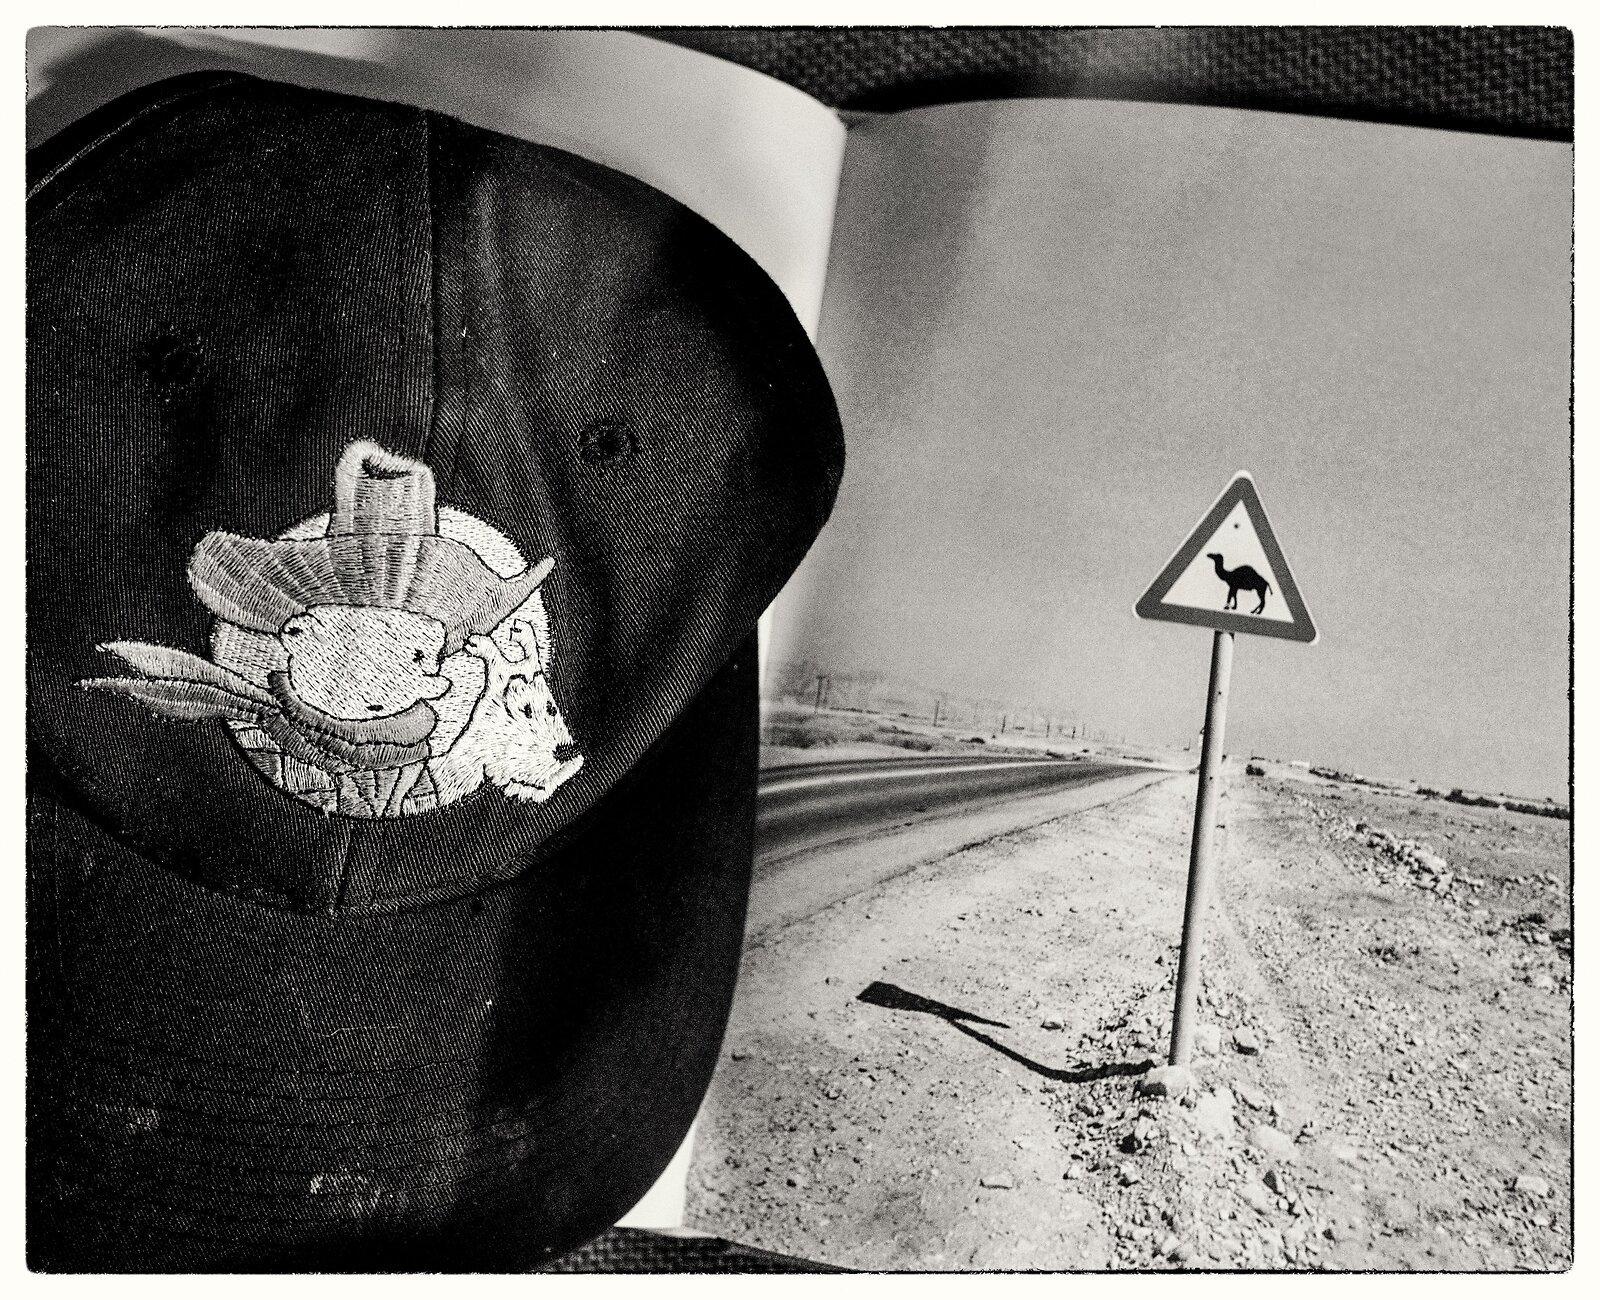 PenF_Tintin_desert_cowboy_monochrome.jpg